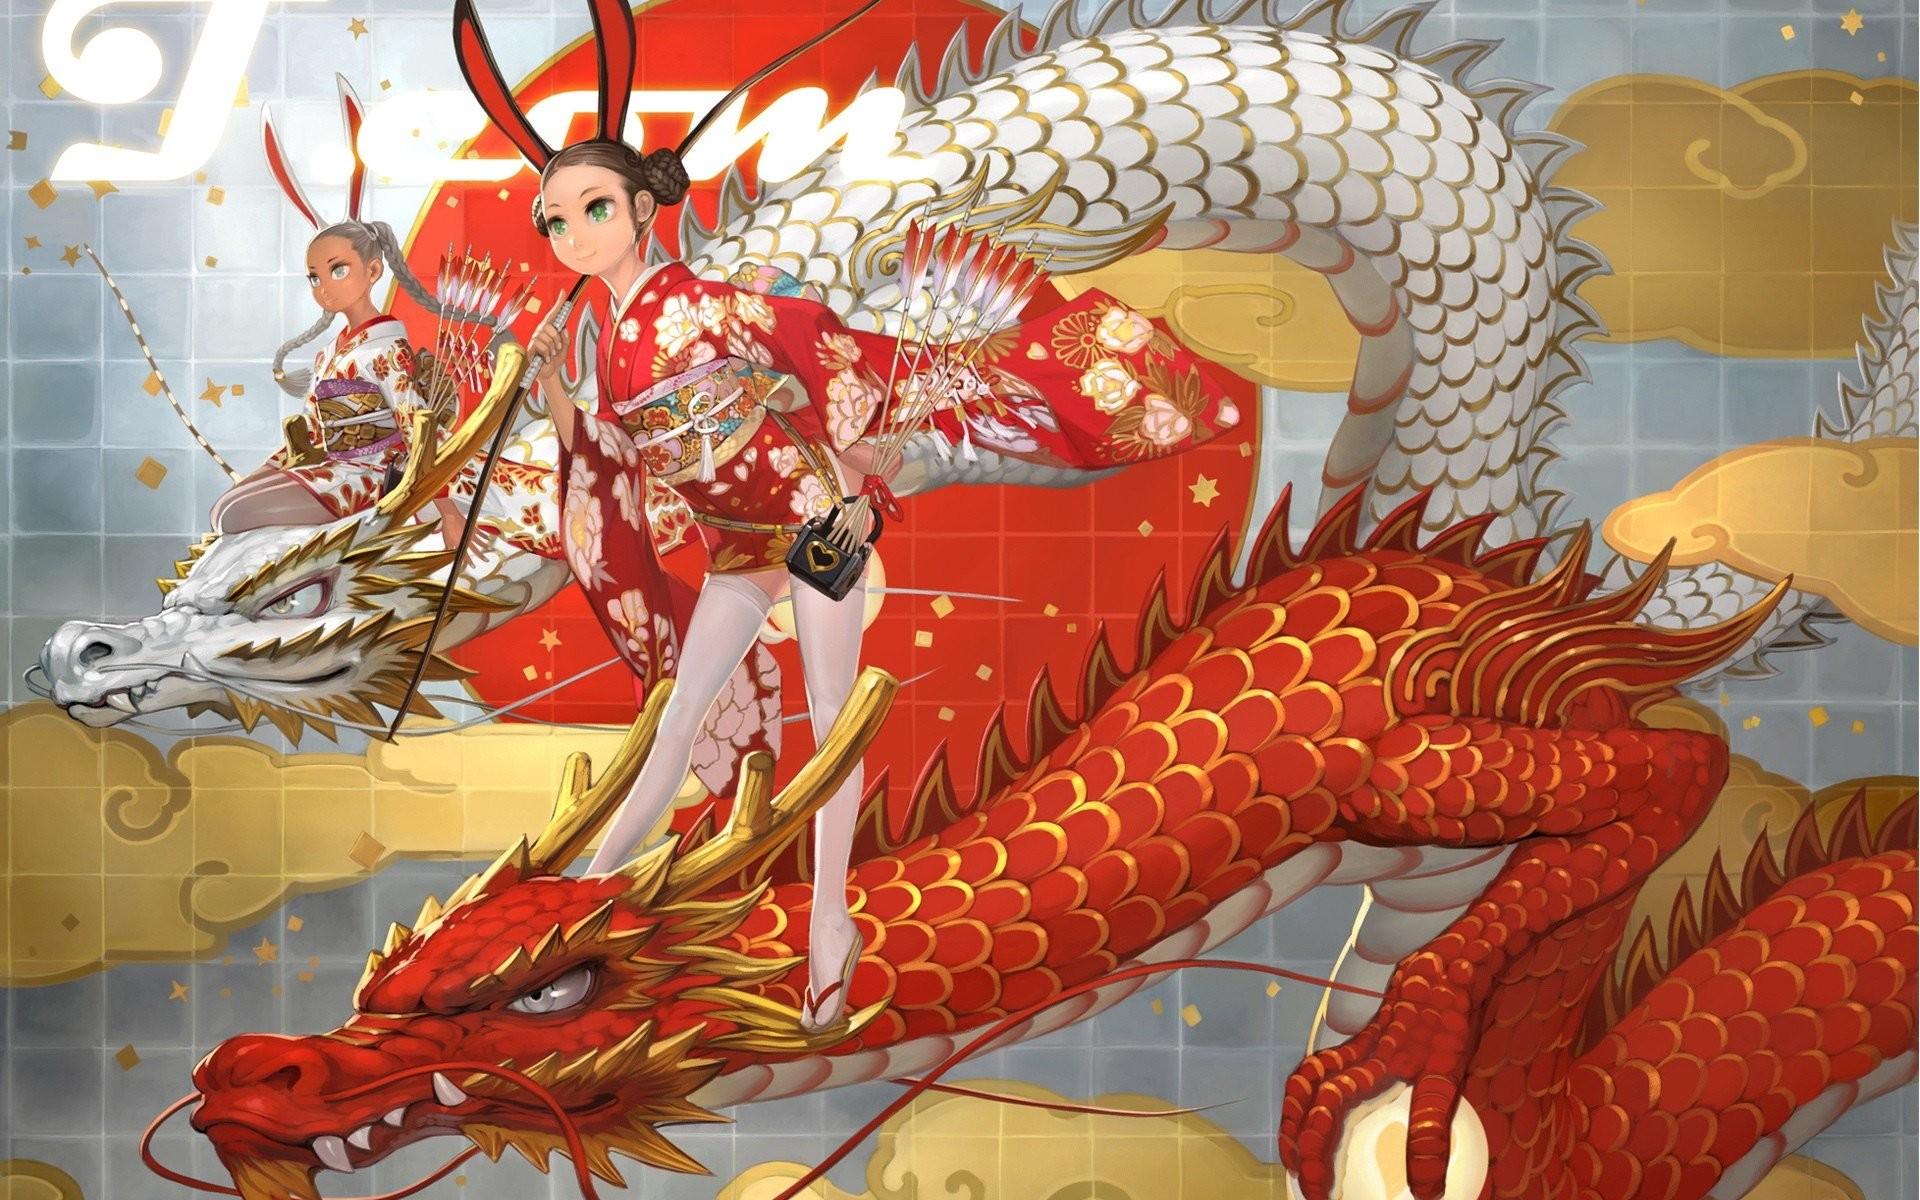 Dragons dress thigh highs artwork bunny ears yukata Japanese clothes anime  girls wallpaper     290046   WallpaperUP